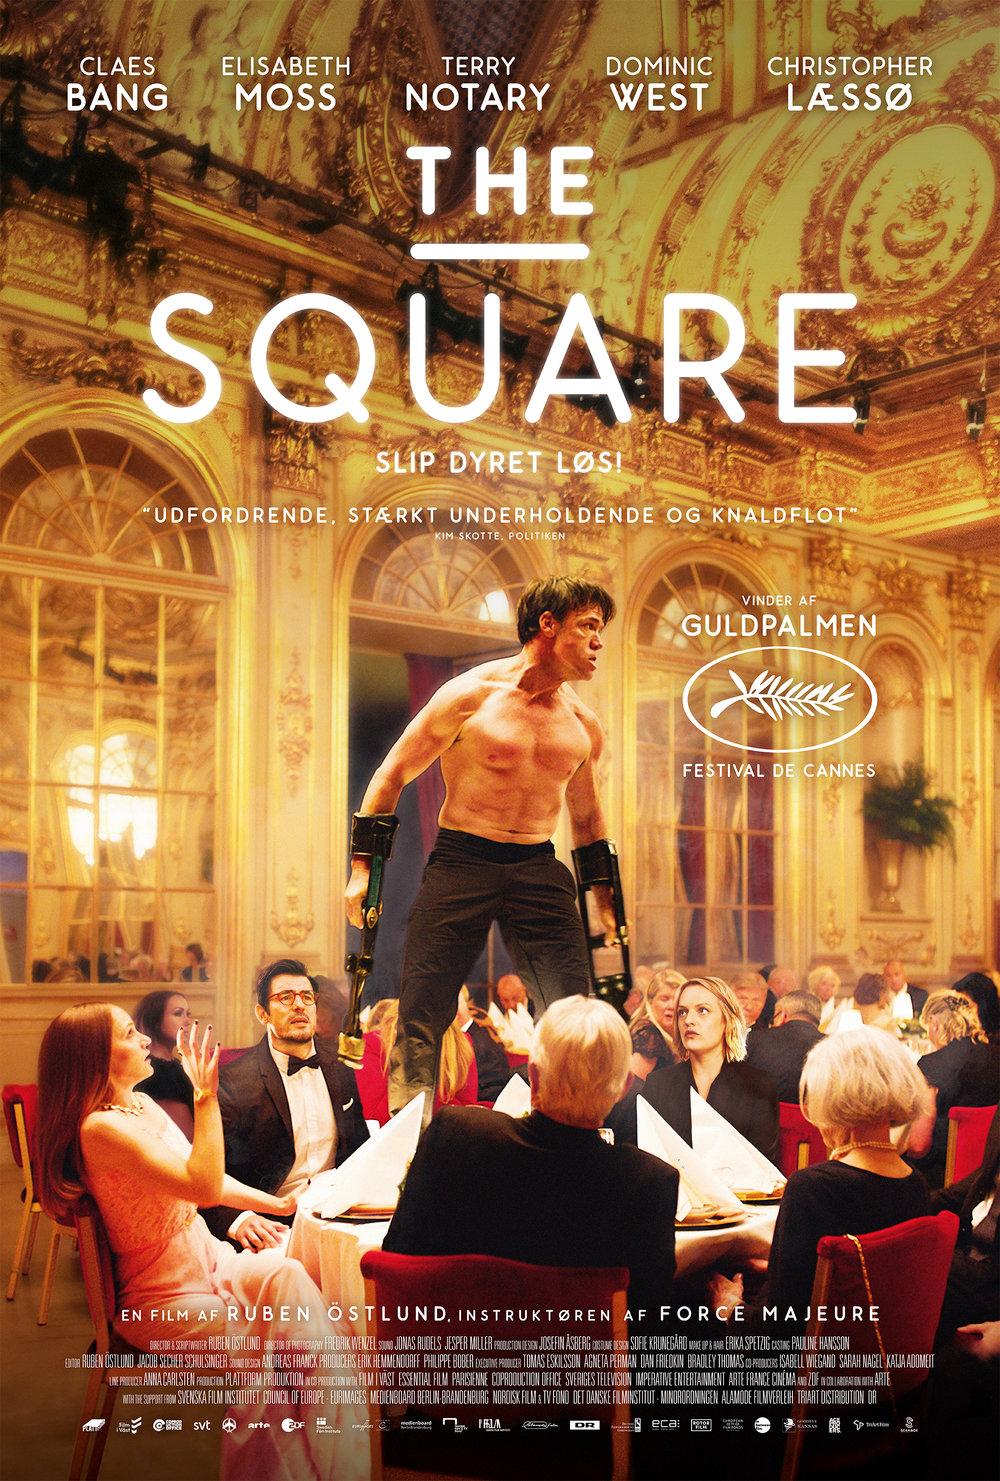 TheSquare_Poster_DK.JPG